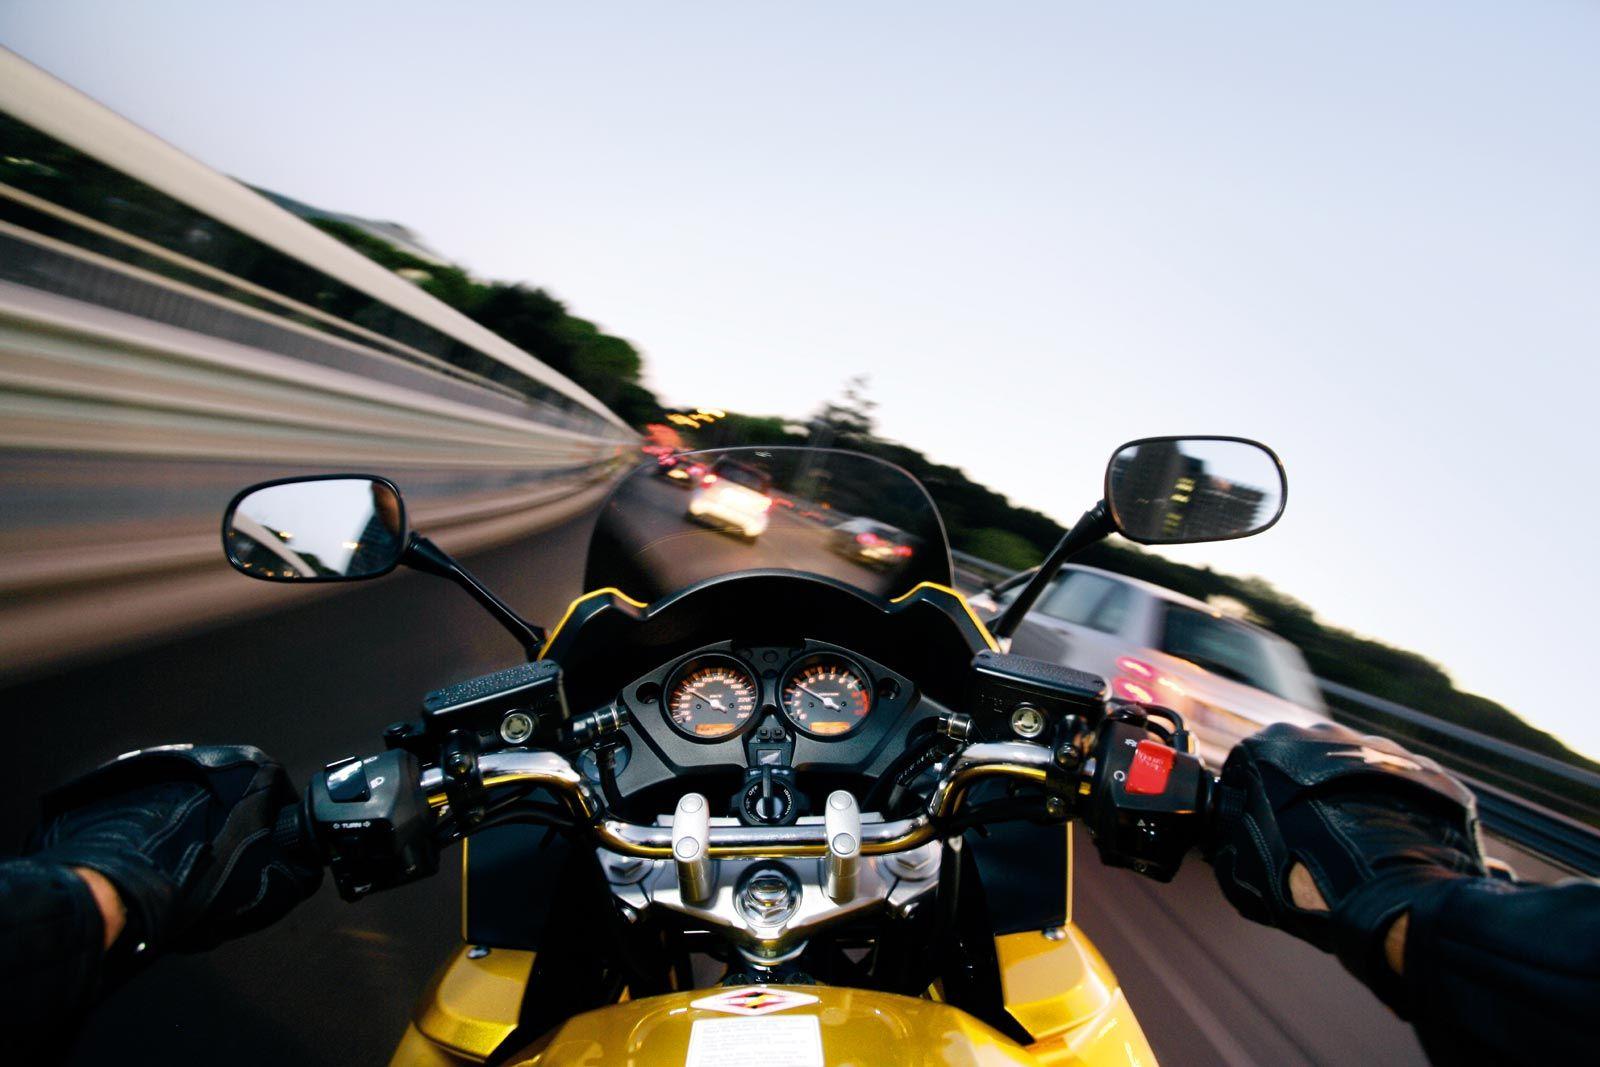 вот то, картинки мотоцикл скорость чебоксарский трикотаж интернет